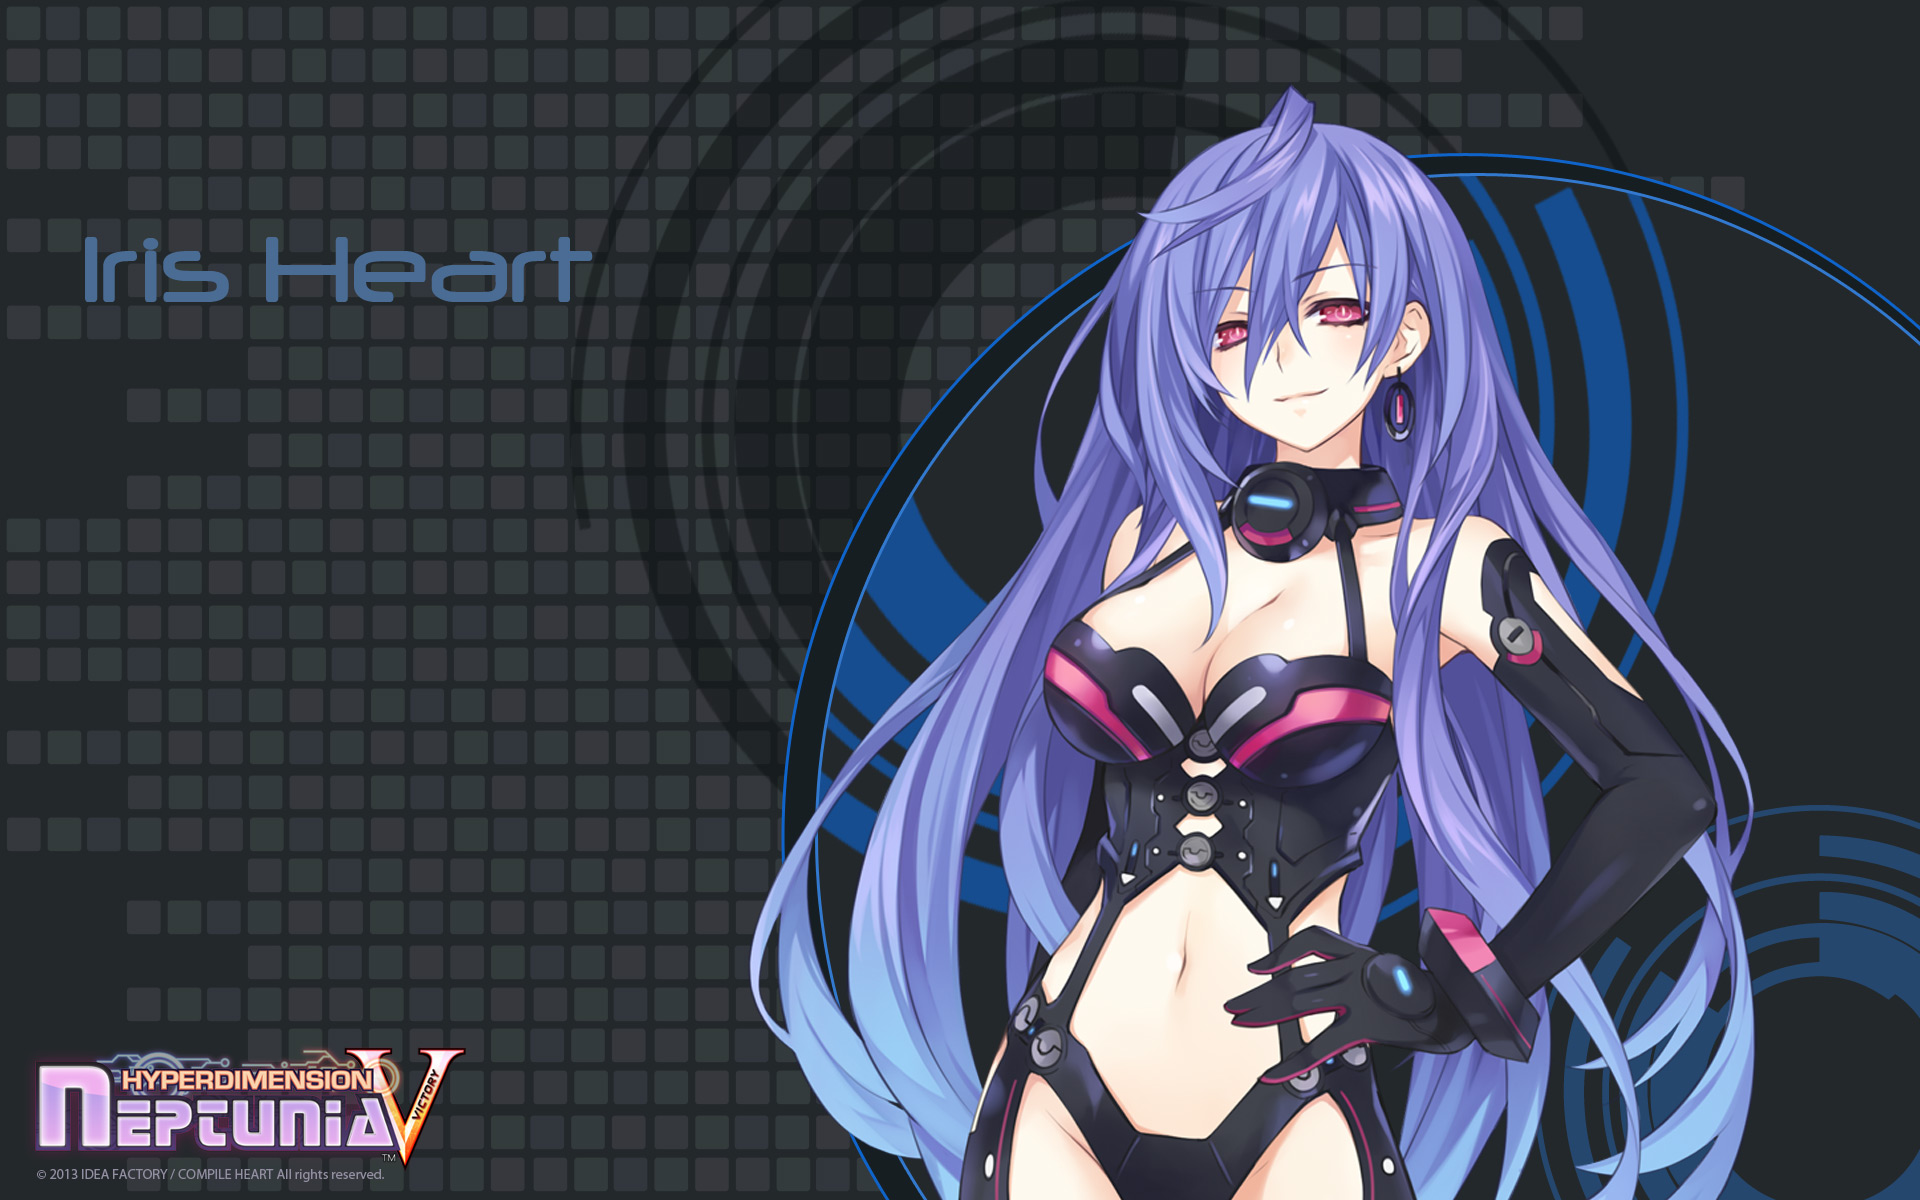 Hyperdimension Neptunia Victory Wallpaper 010 Iris Heart Plutia